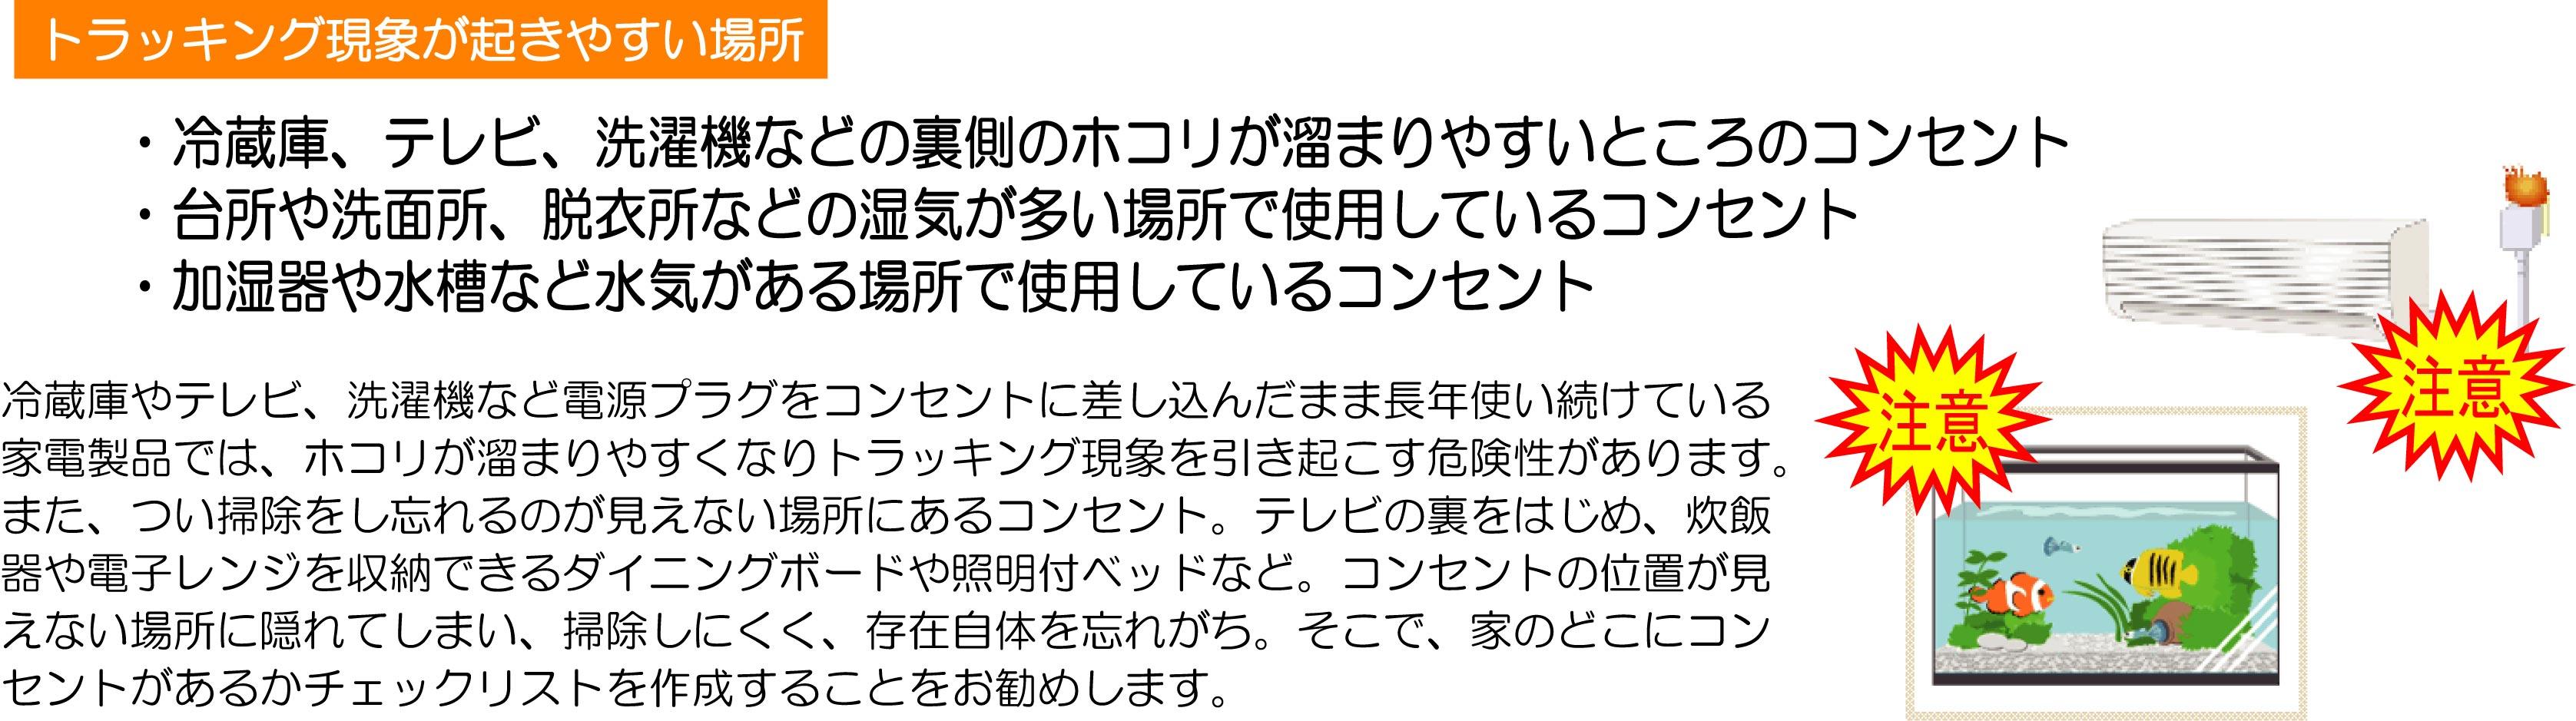 KuraSi-natu-sin79-13.jpg